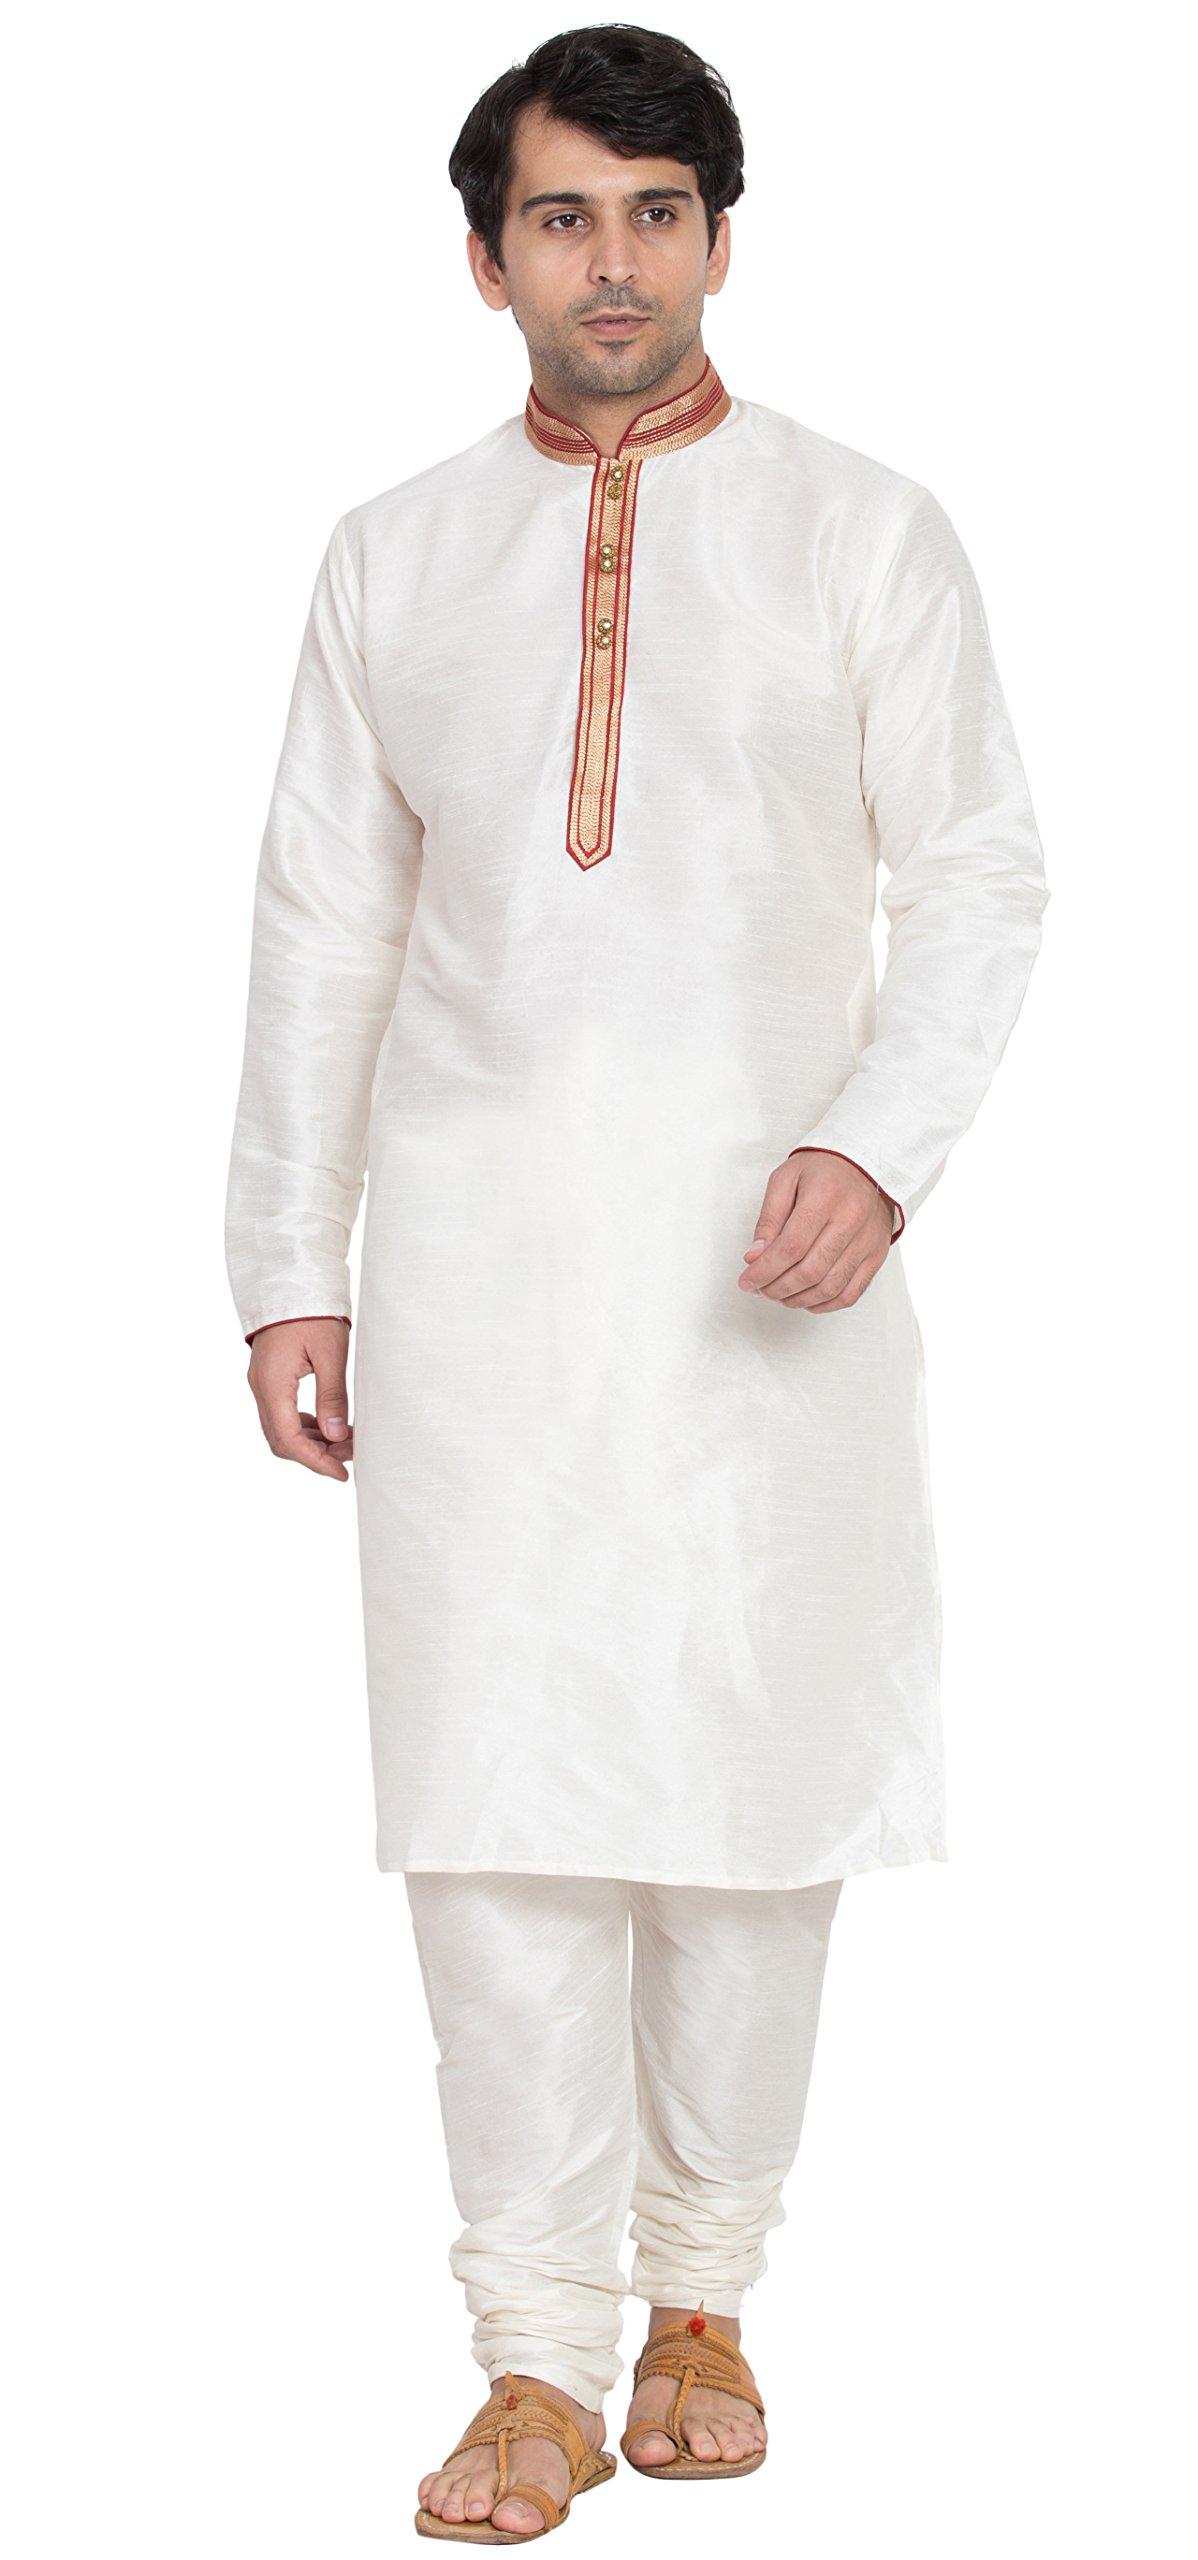 Offwhite Shirt Kurta Pajama Set for Men Indian Fashions Summer Dress -L